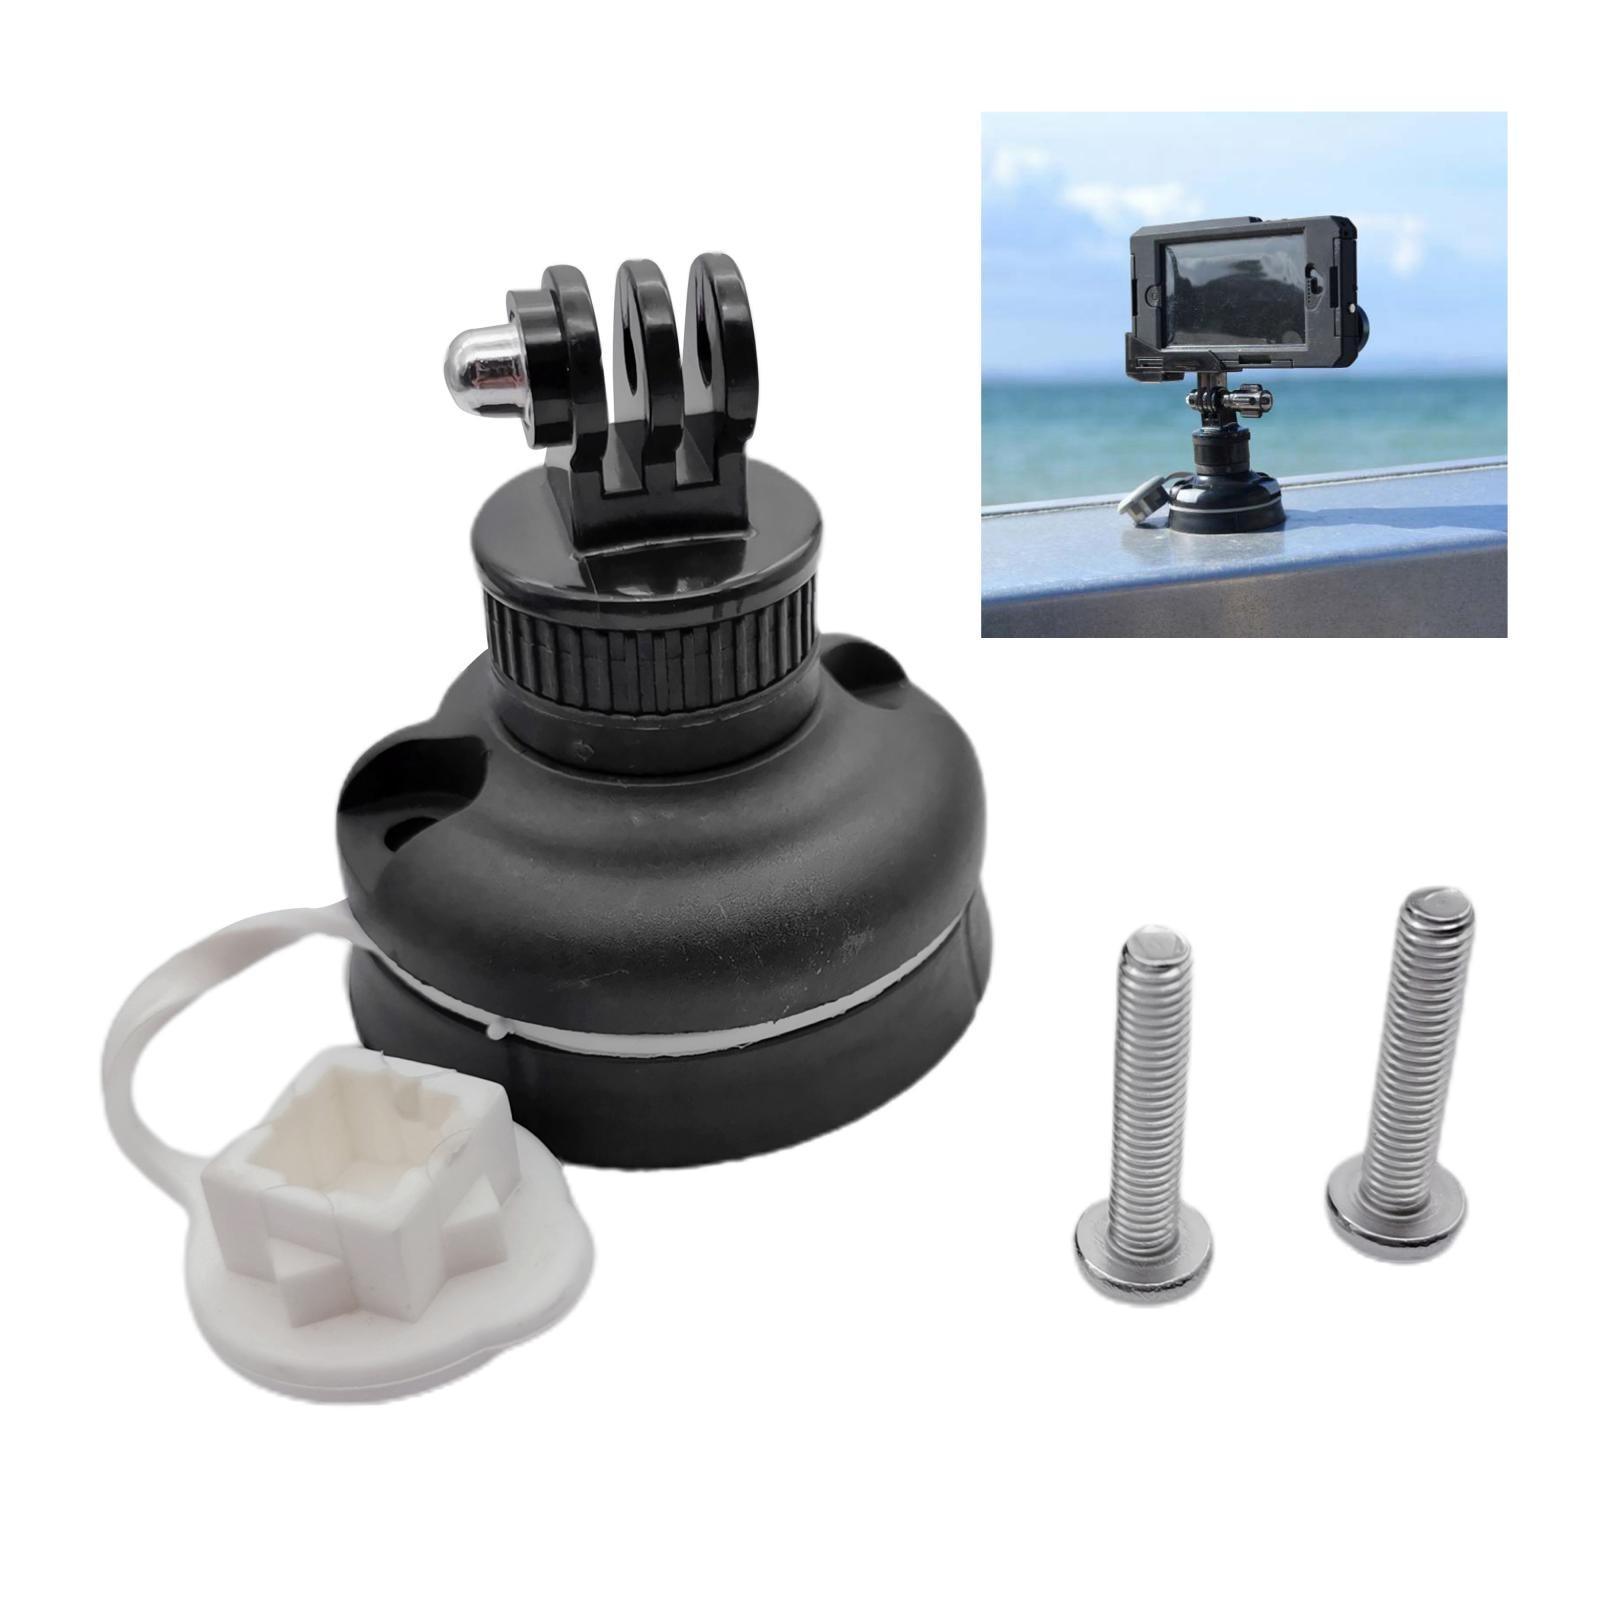 ABS Plastic Safety Kayak Sports Camera Mount Base Support Marine Inflatable Boat Canoe Compass Holder Bracket Mounting Kit